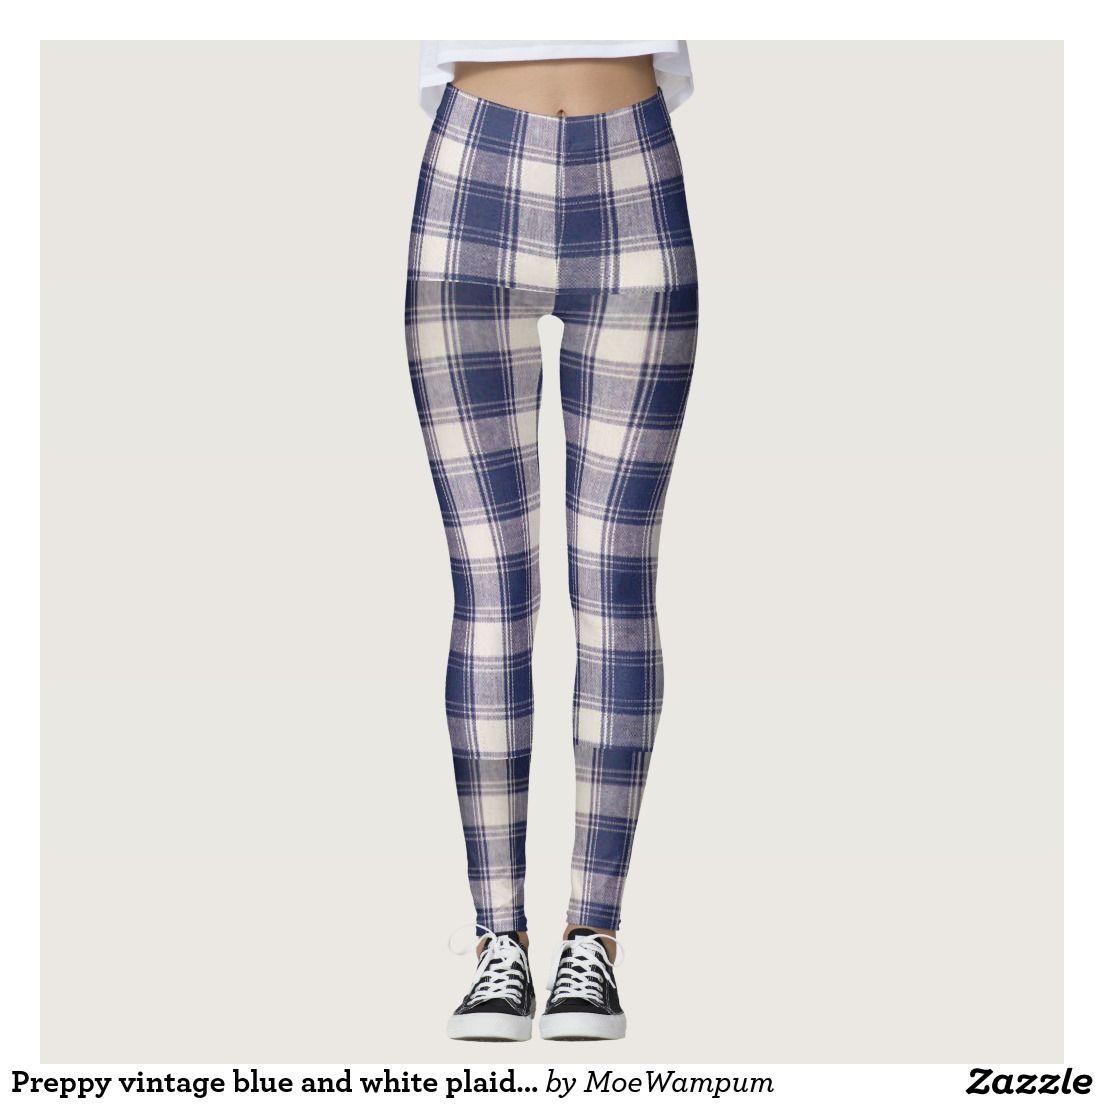 Preppy vintage blue and white plaid leggings